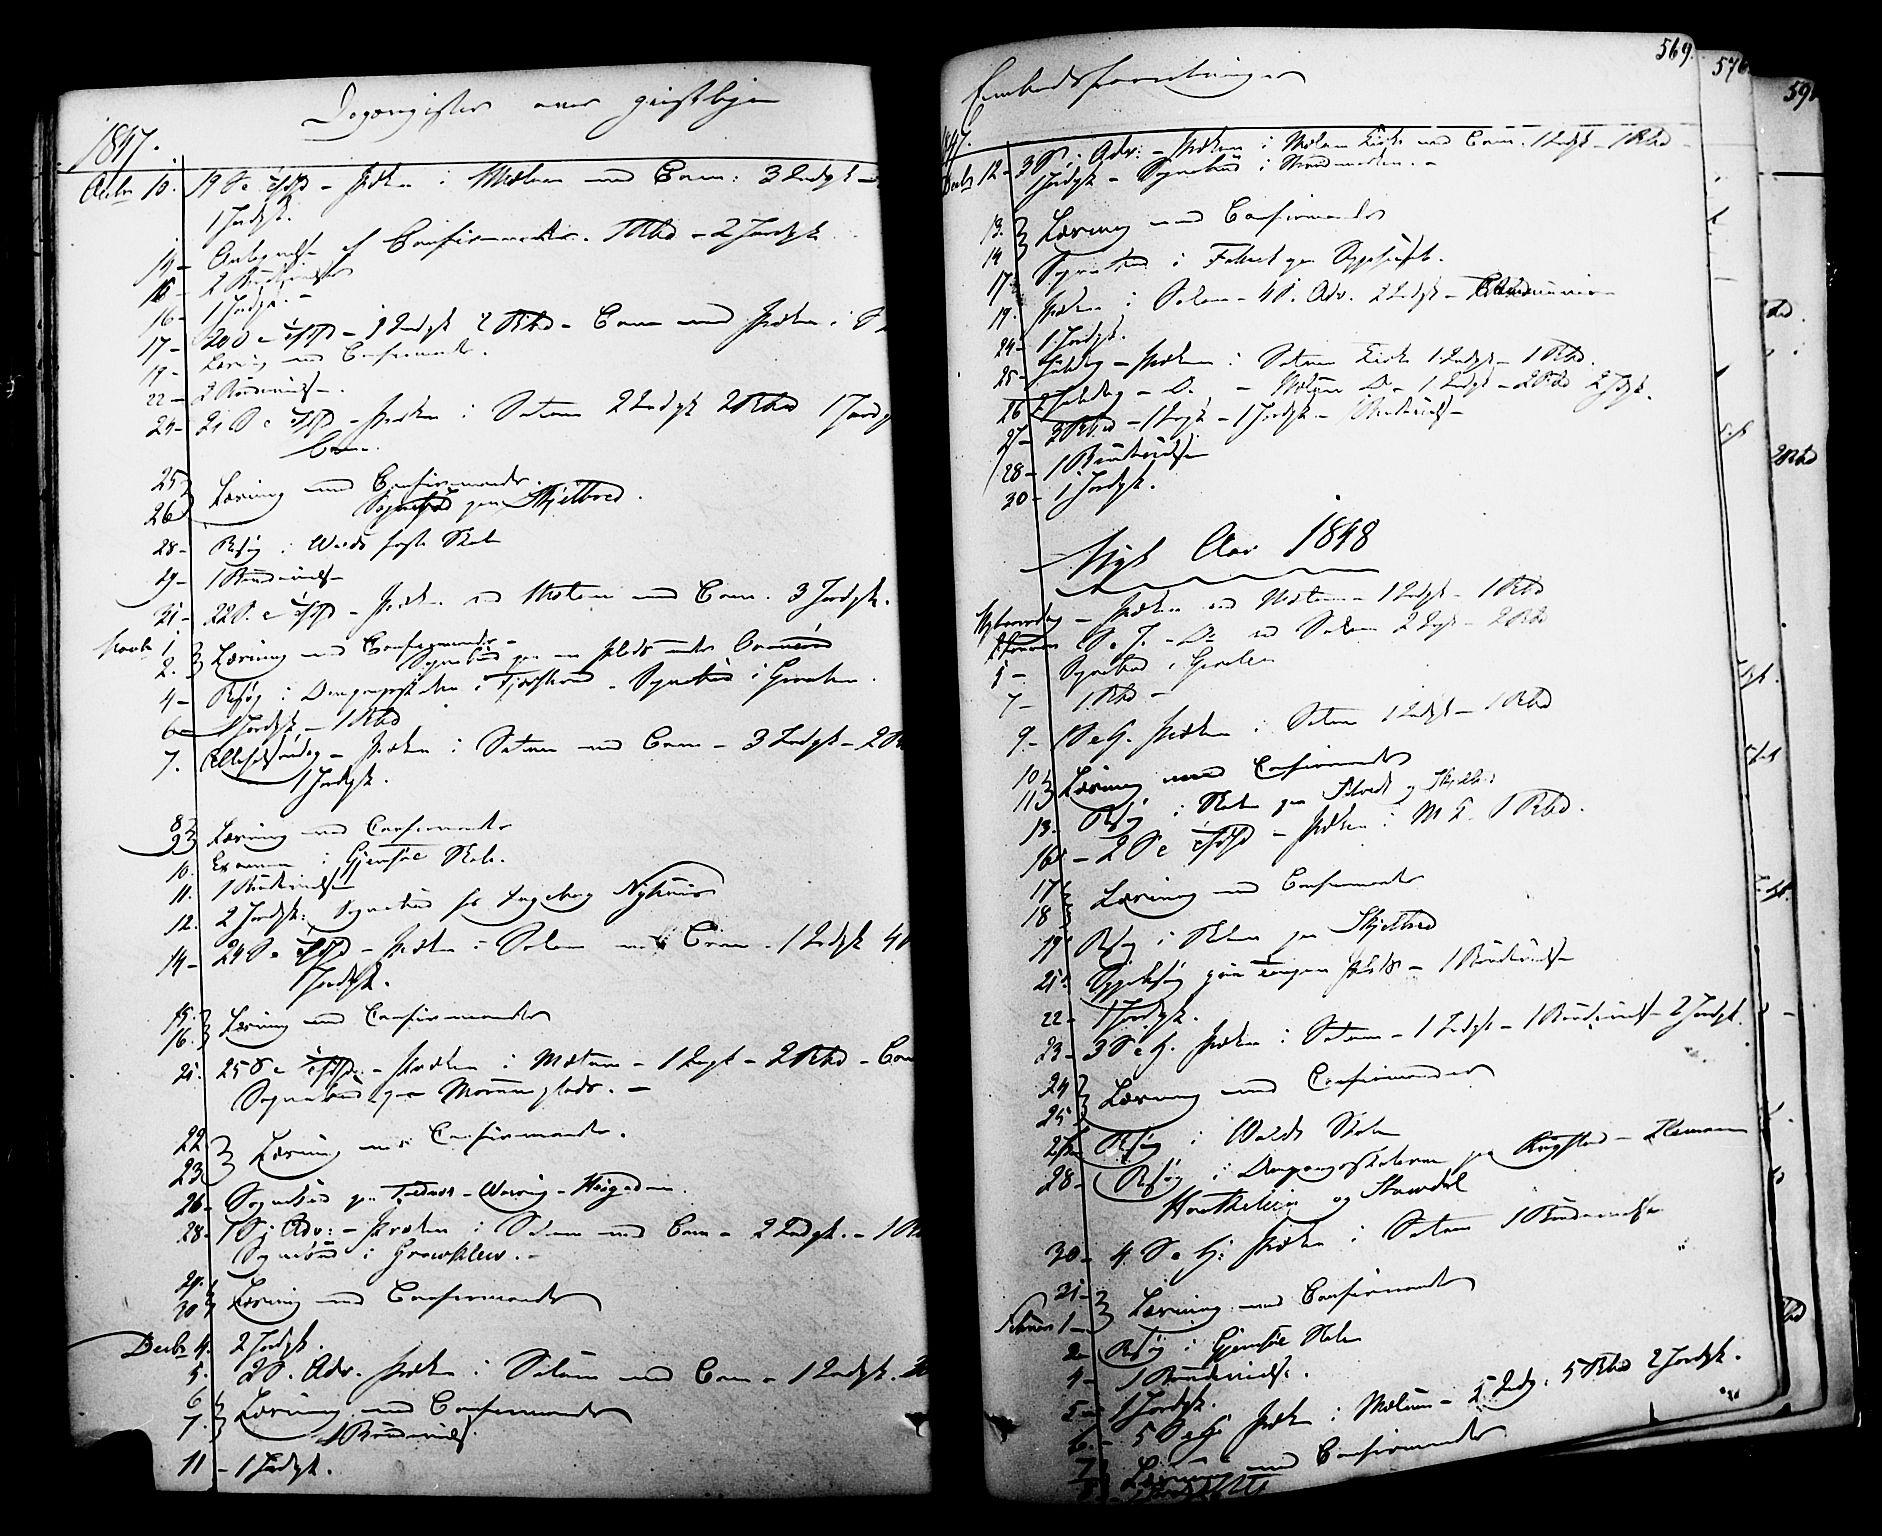 SAKO, Solum kirkebøker, F/Fa/L0006: Ministerialbok nr. I 6, 1844-1855, s. 569